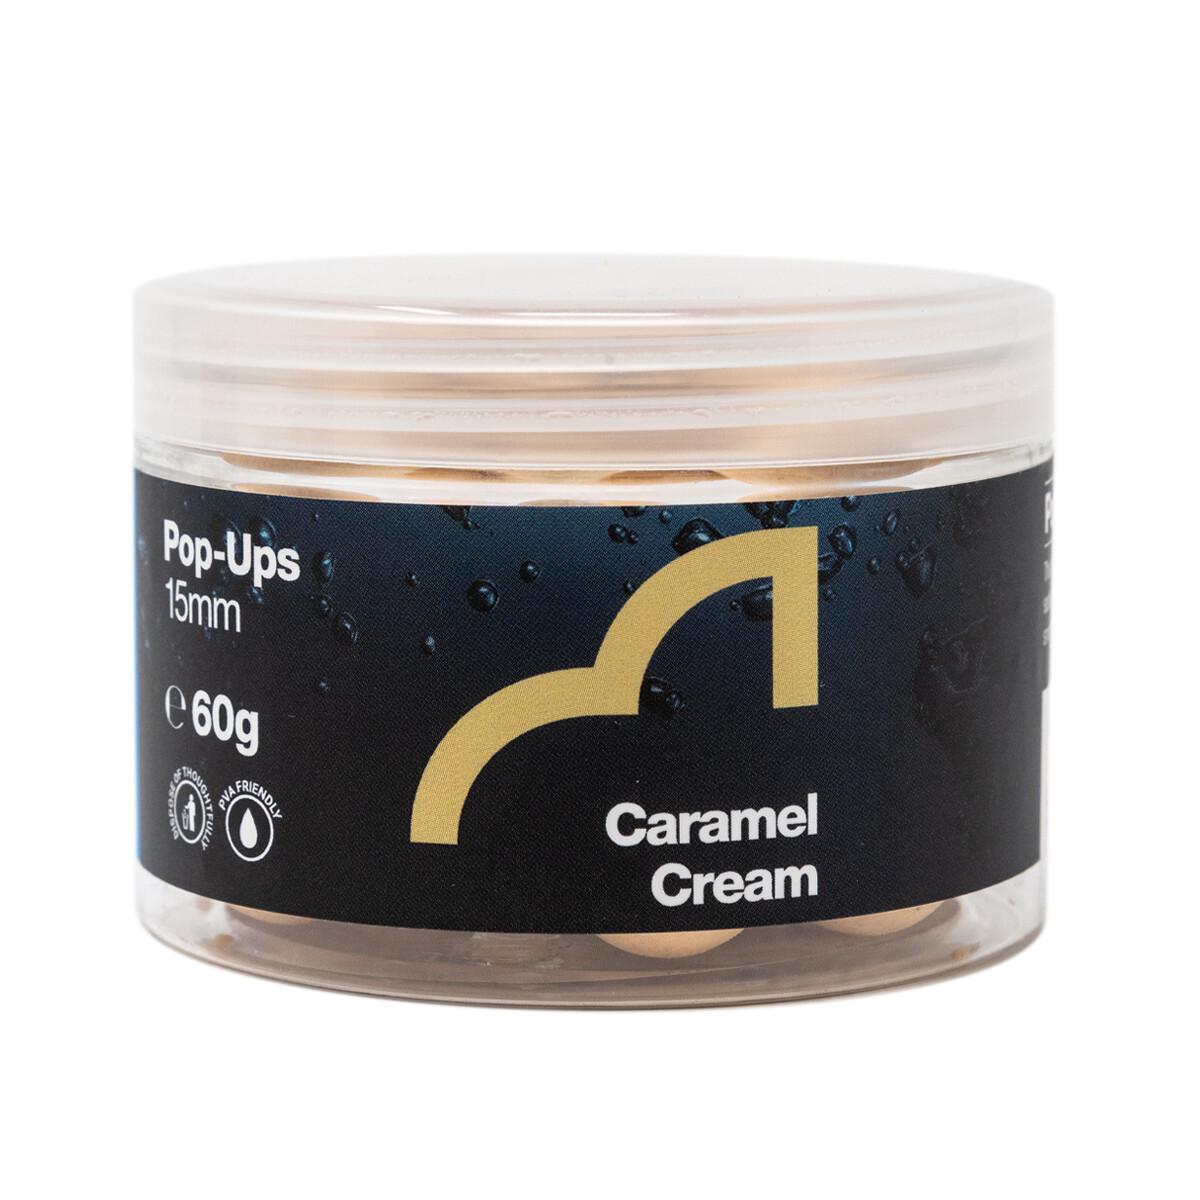 Caramel Cream Pop-Ups 15mm